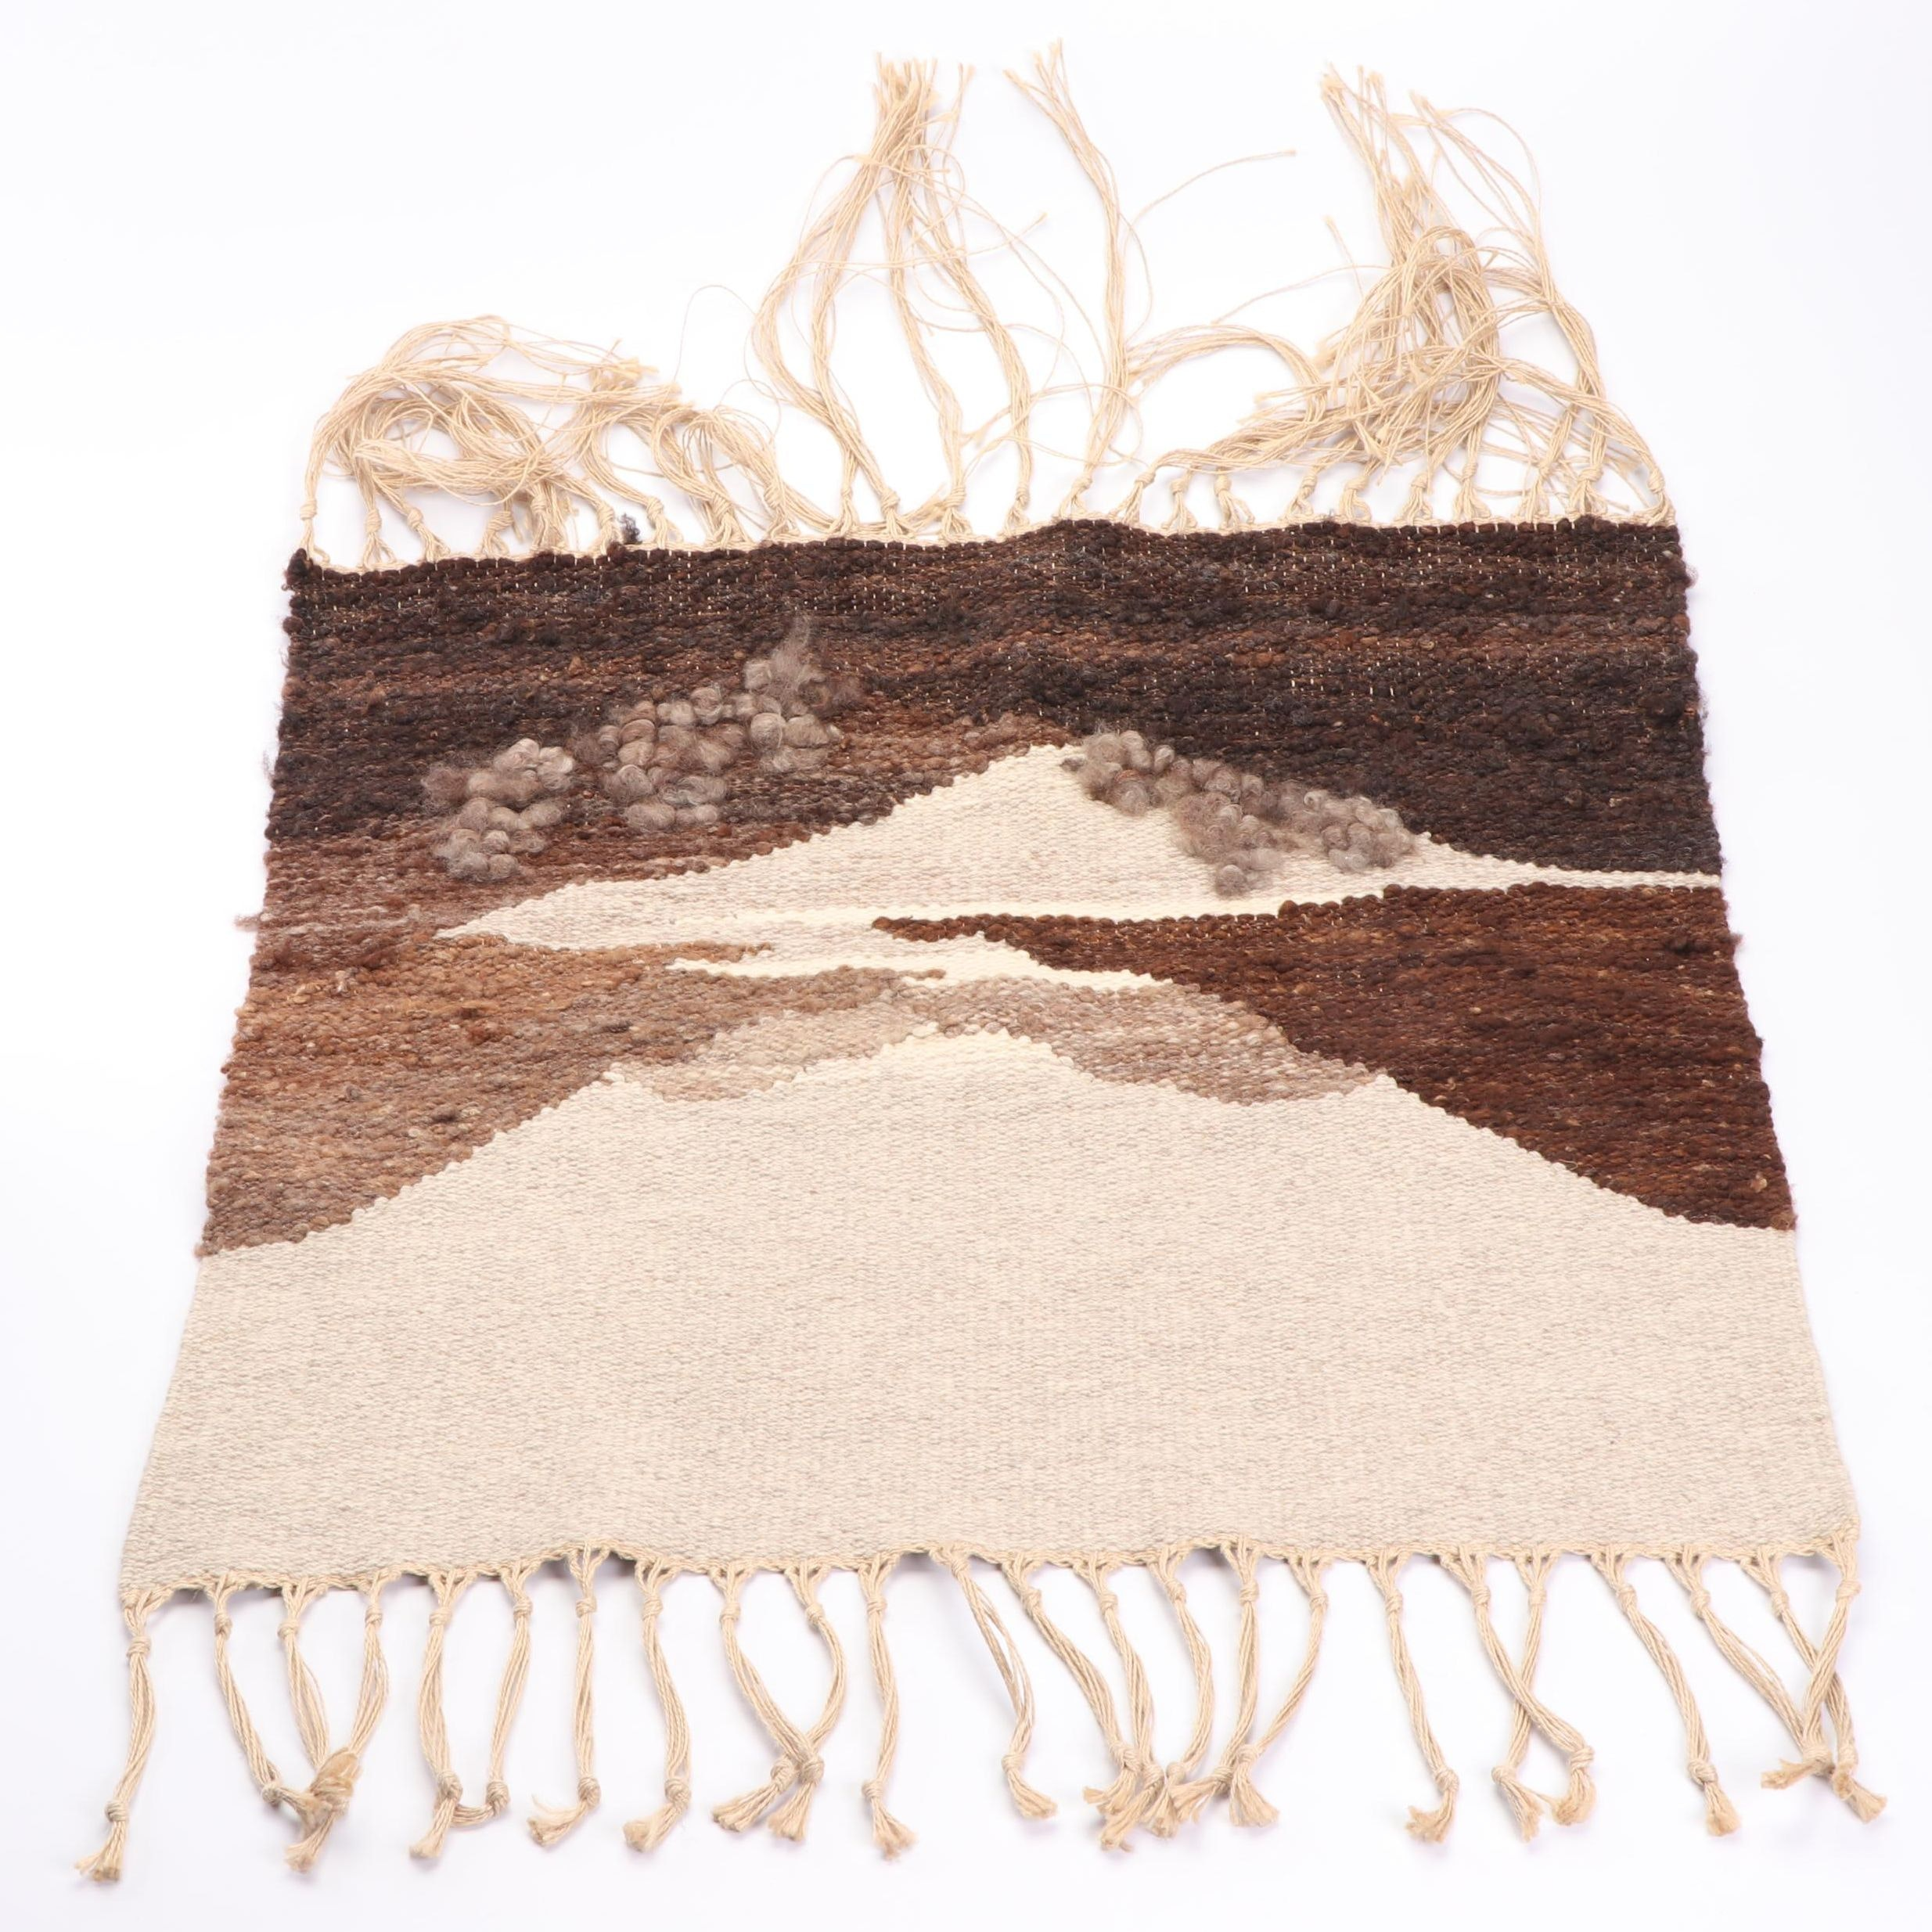 Handwoven New Zealand Bev. Macaulay Wool Rug